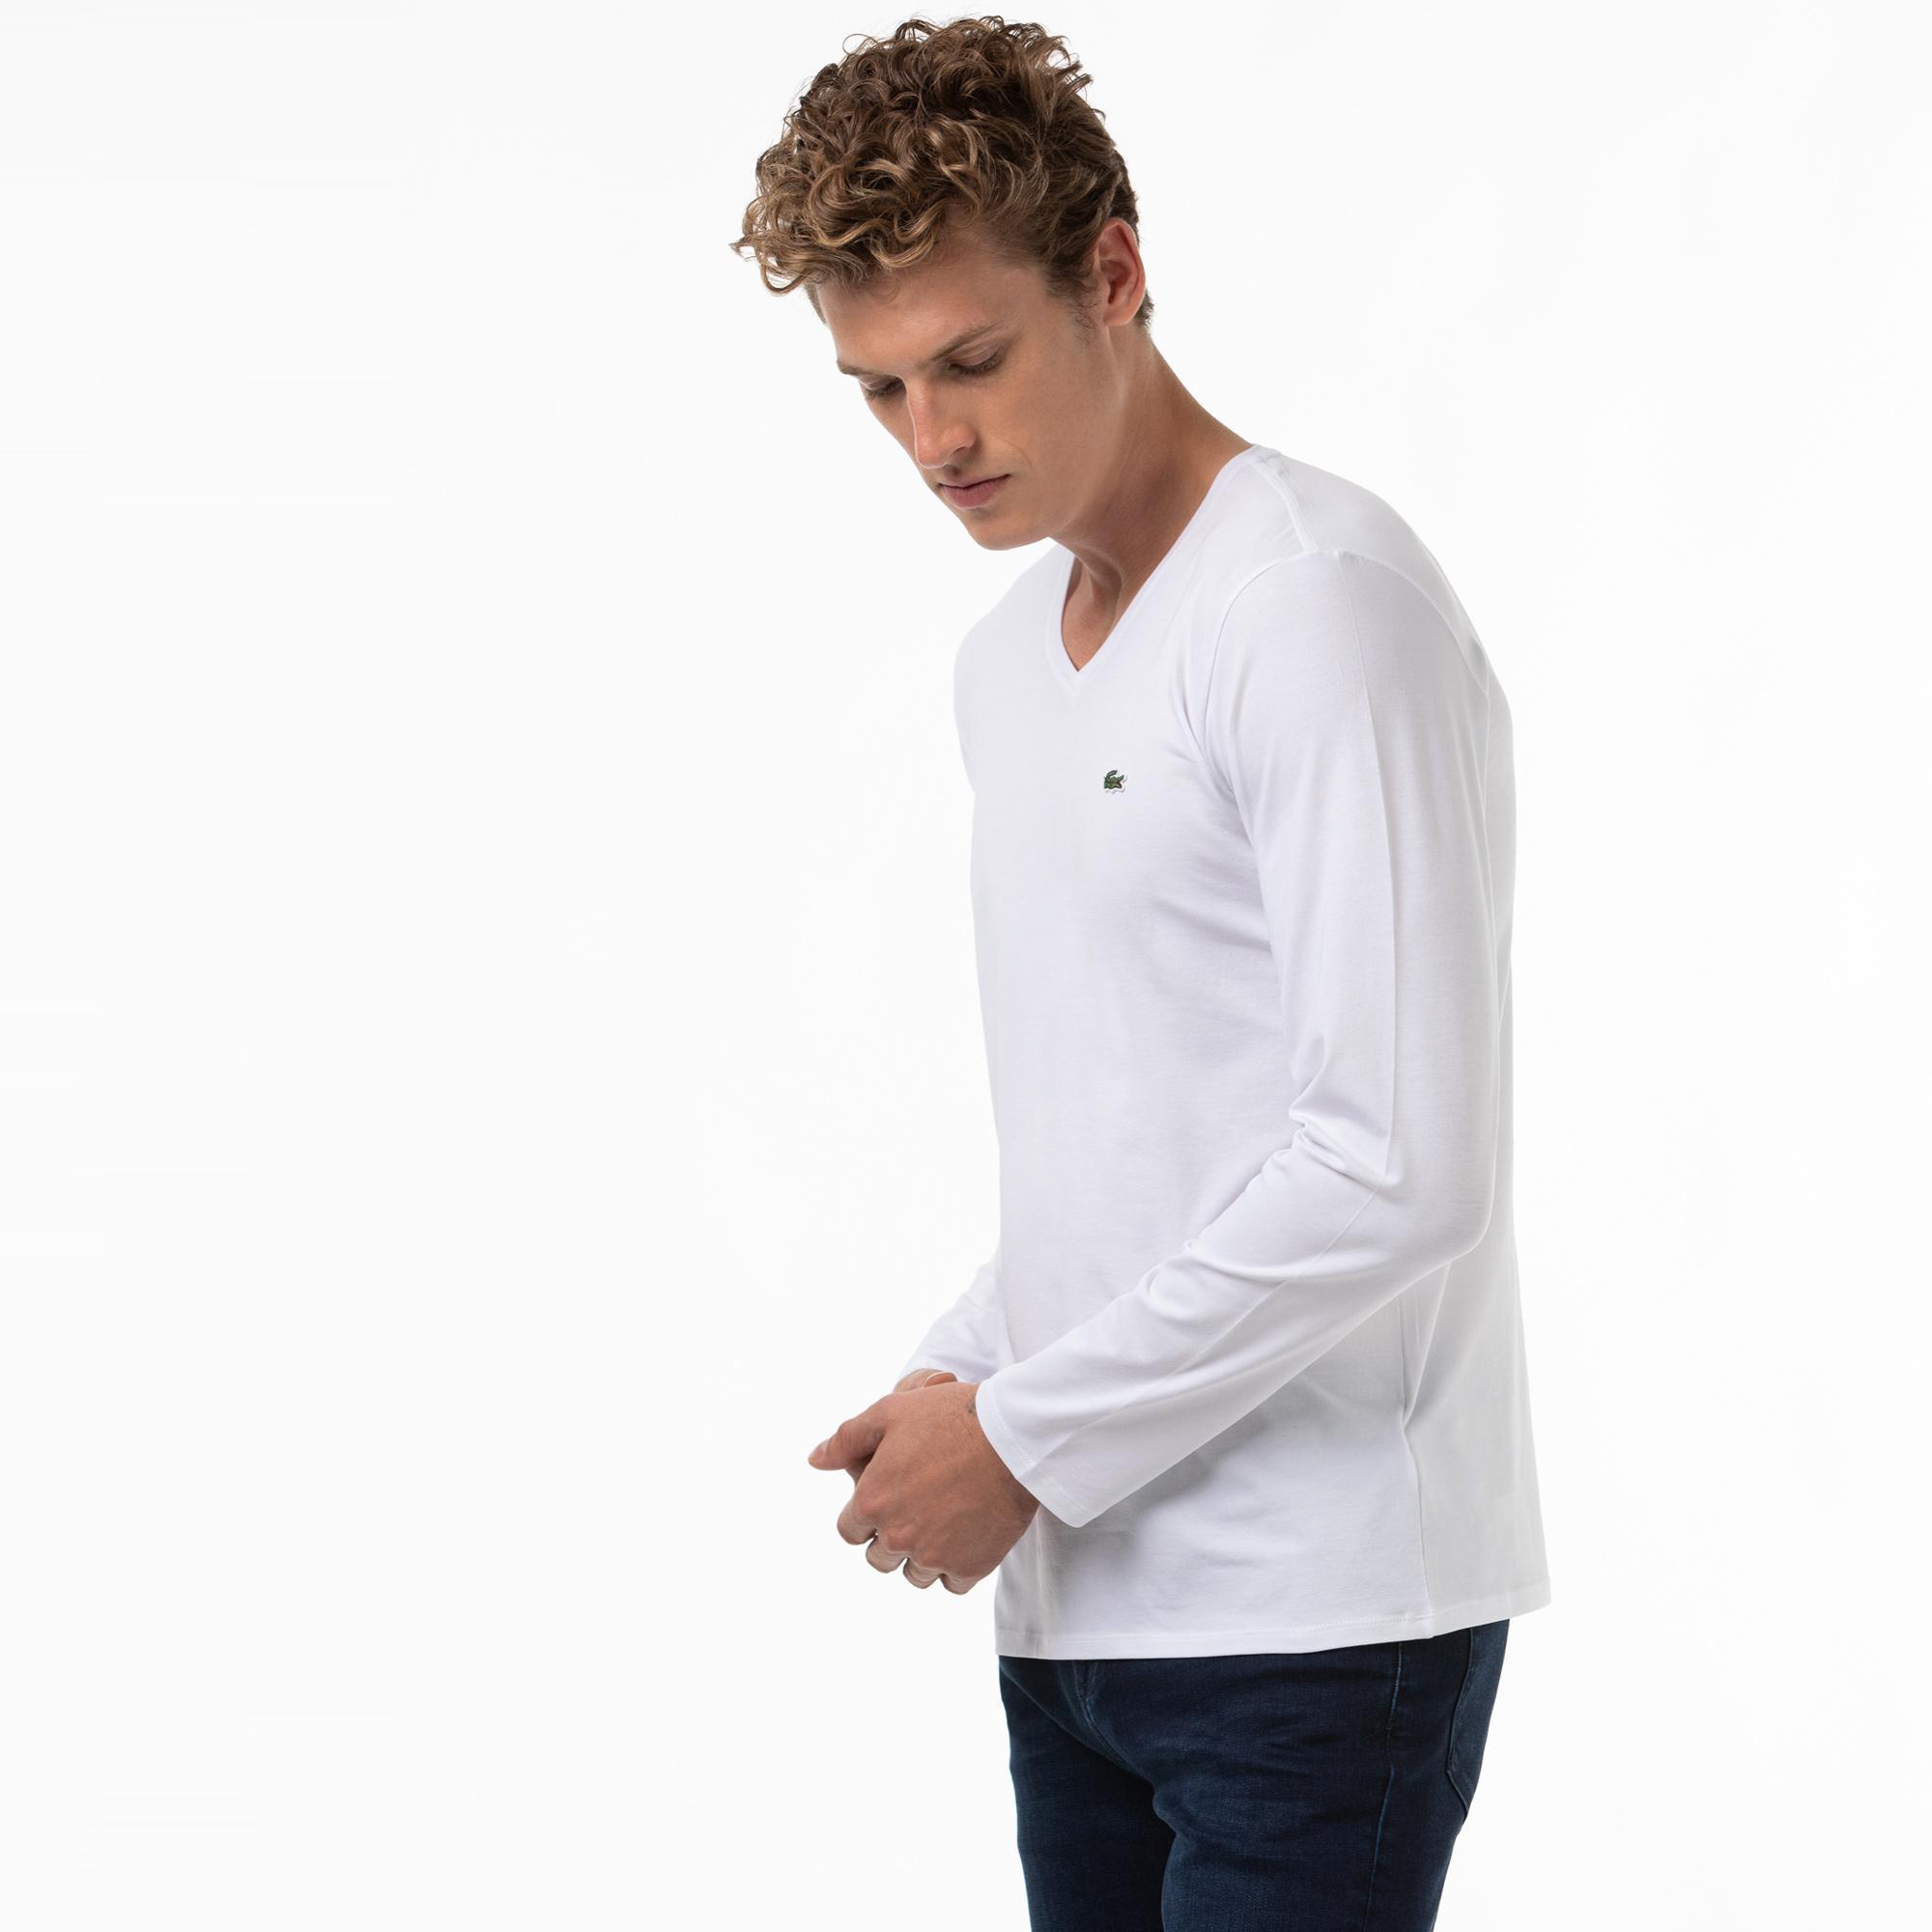 Lacoste Erkek V Yaka Uzun Kollu Beyaz T-Shirt